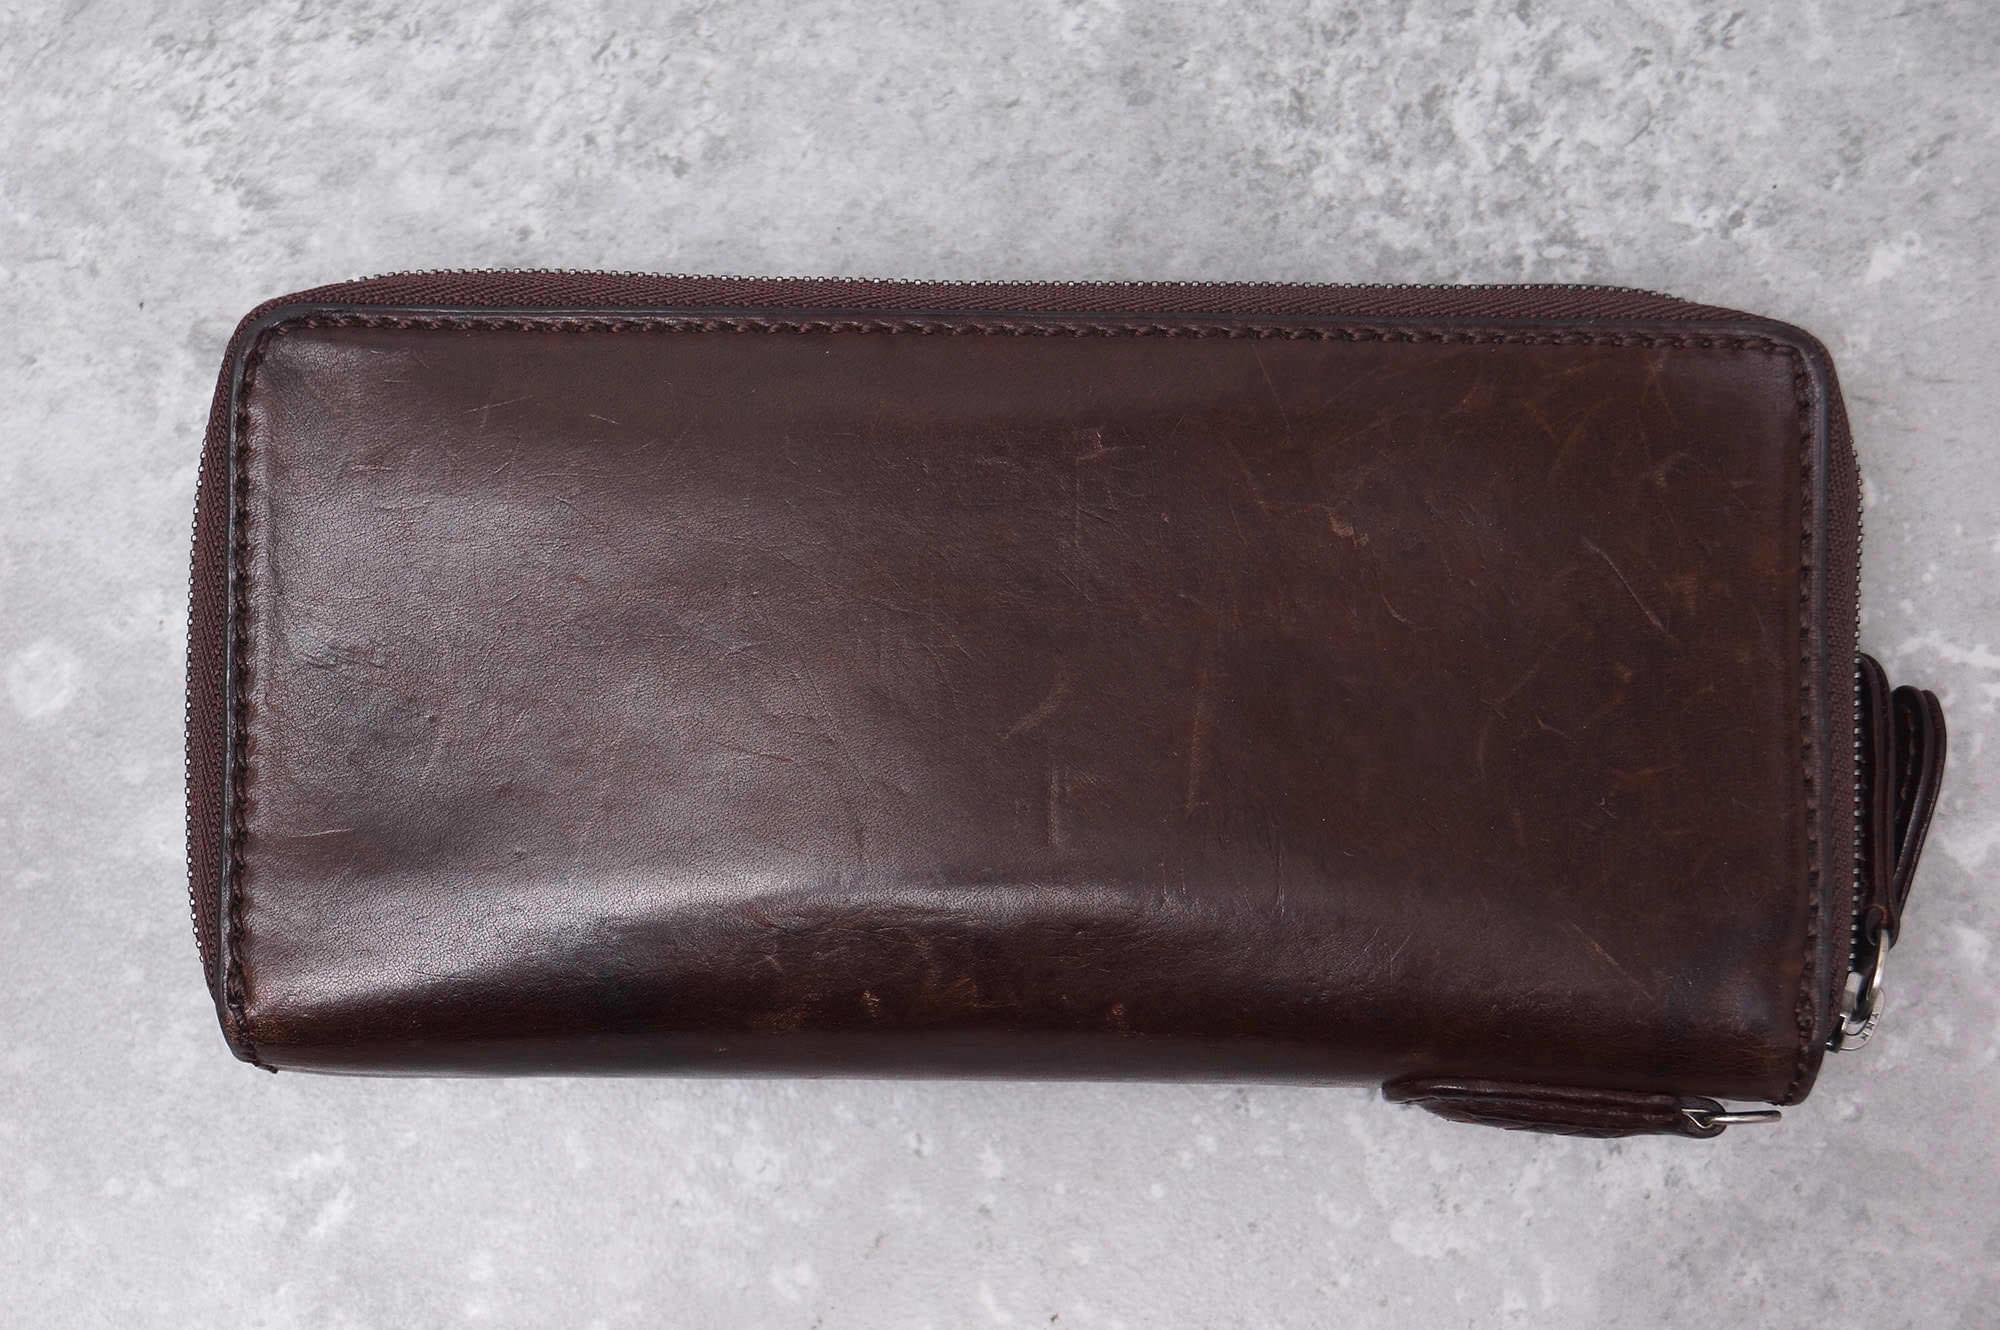 93e11187ee8a ノマドイ / NOMADOI 長財布 メンズ ダークブラウン 焦げ茶 ALABAMA(アラバマ) ラウンドファスナー 北米産ベジタブルタンニン -  ブランディング